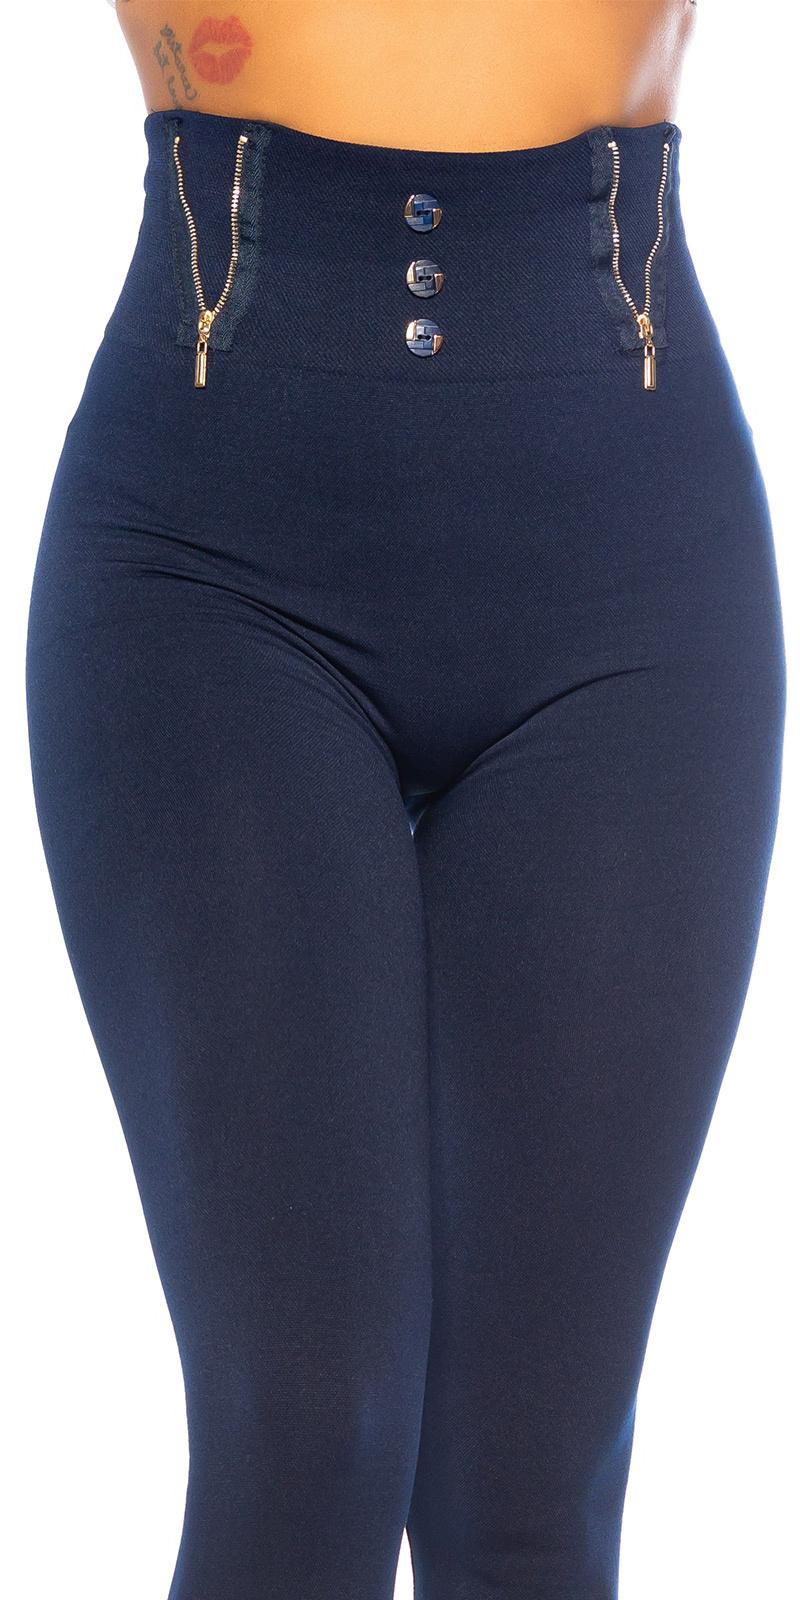 Sexy hoge taille fashion thermo leggings met ritssluiting detail marineblauw